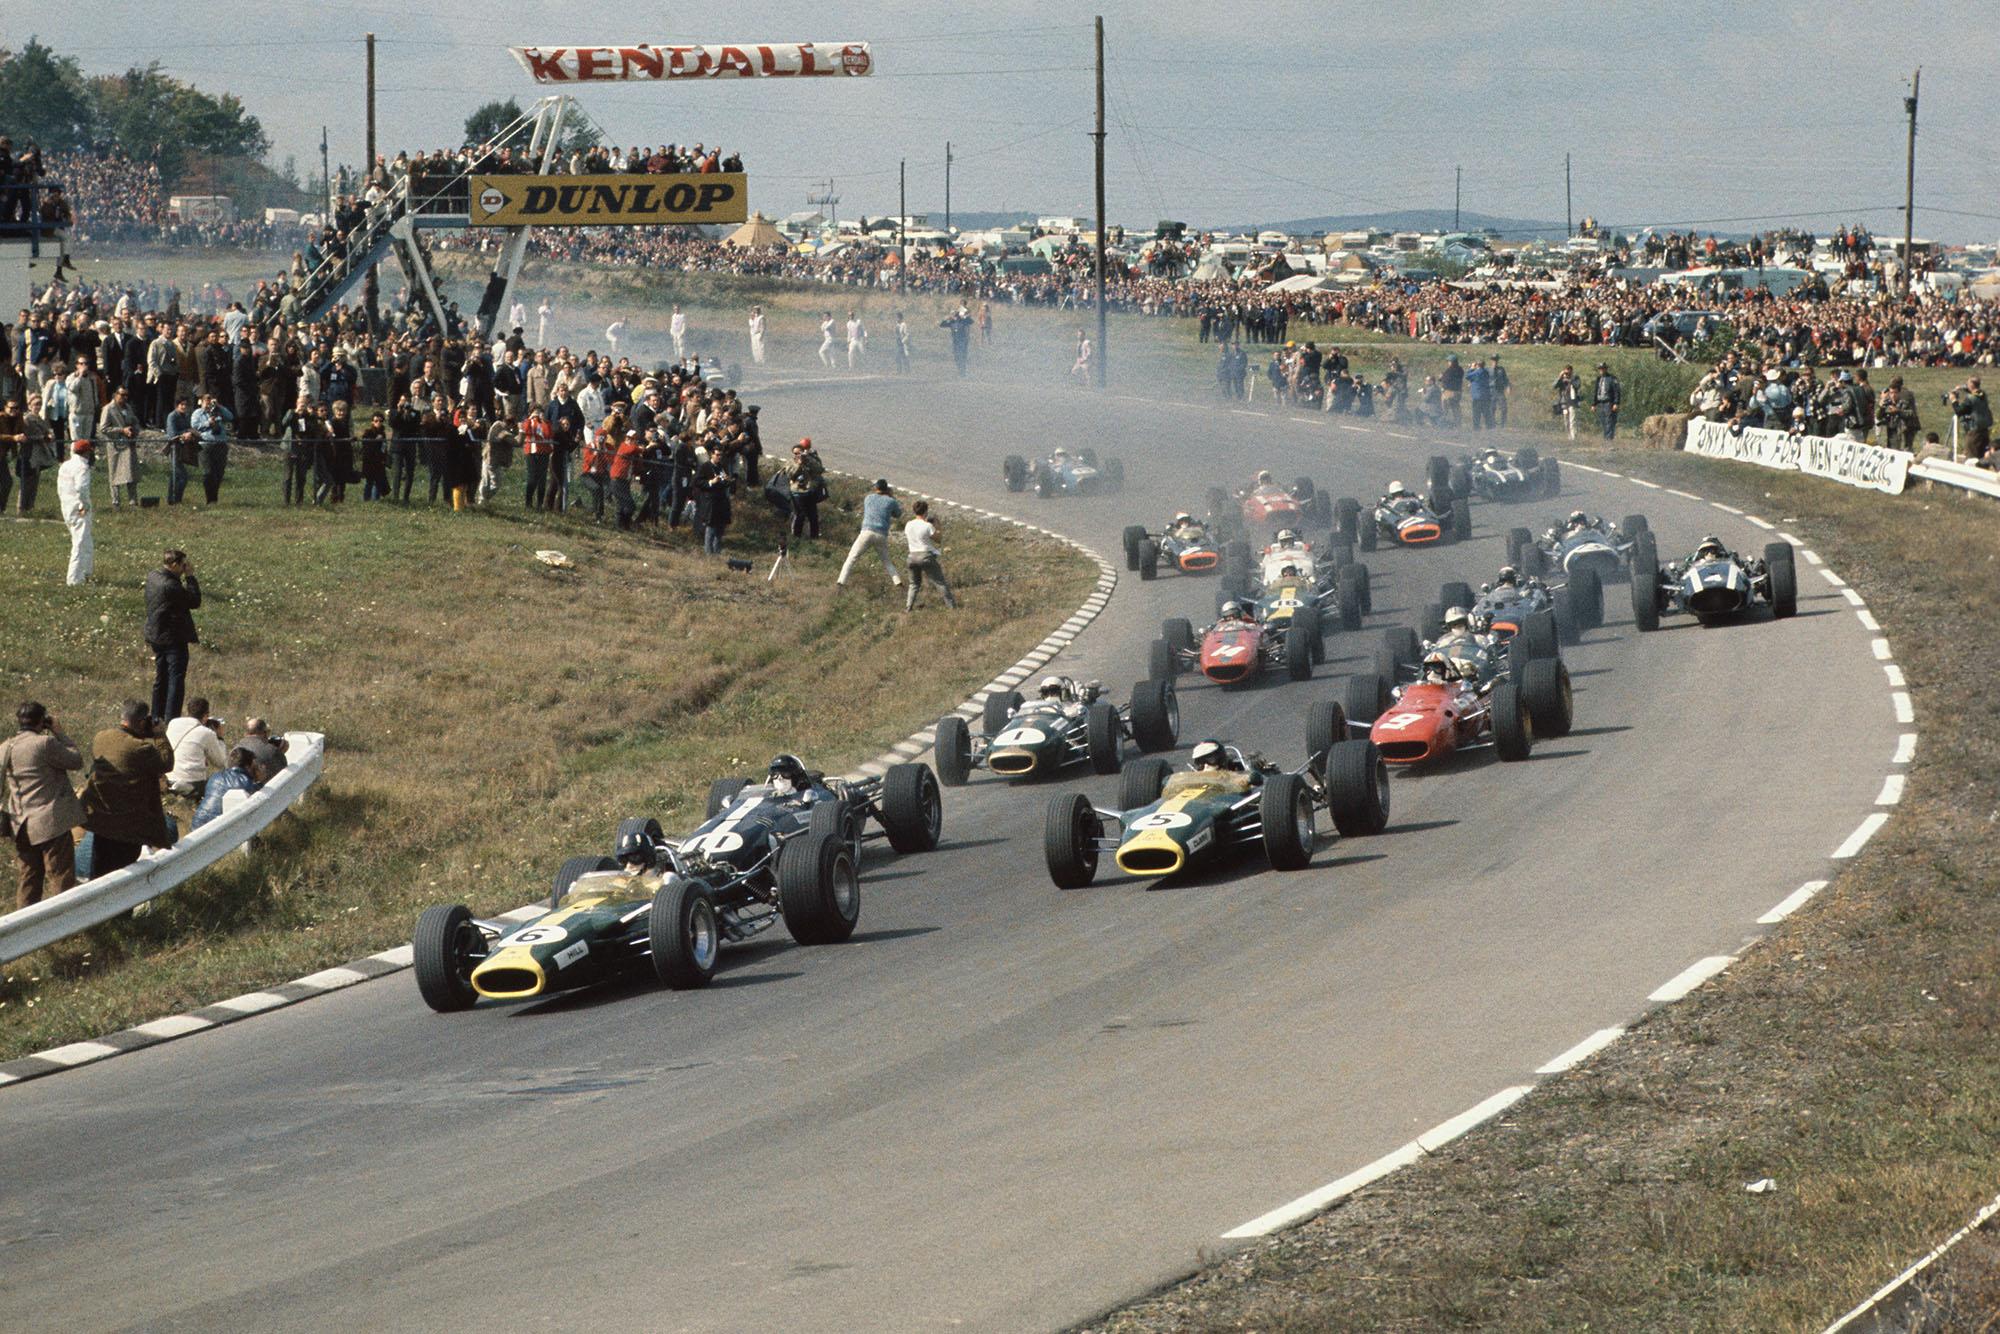 Watkins Glen, New York, USA. 30/9-1/10 1967. .At the start Graham Hill (Lotus 49 Ford) leads from Dan Gurney (Eagle T1G Weslake), Jim Clark (Lotus 49 Ford), Chris Amon (Ferrari 312), Jack Brabham and Denny Hulme (Brabham BT24-Repco), Bruce McLaren (McLaren M5A BRM), Jackie Stewart, Jochen Rindt, Moises Solana, Jo Siffert, John Surtees, Mike Spence, Chris Irwin, Jo Bonnier, Jacky Ickx, Guy Ligier and Jean-Pierre Beltoise.